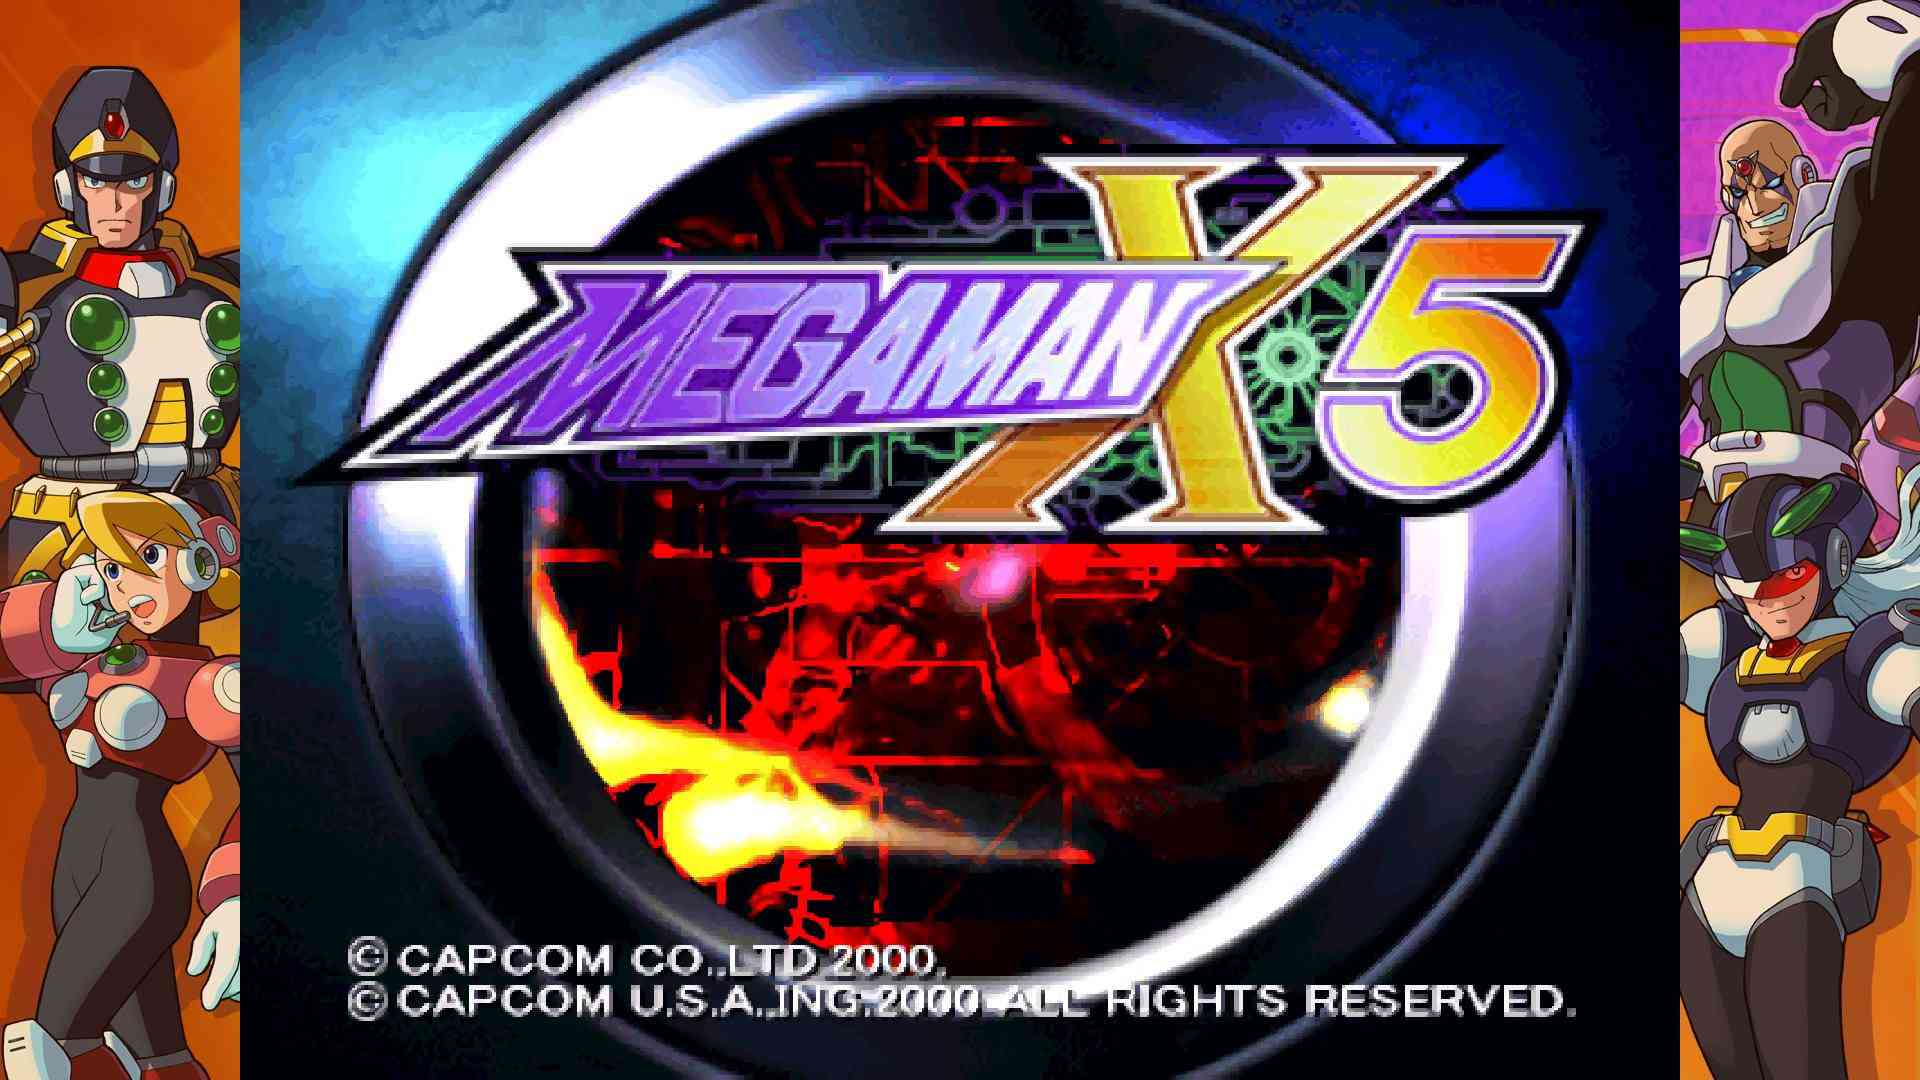 Mega Man X5 was released for multiple platforms in 2000.